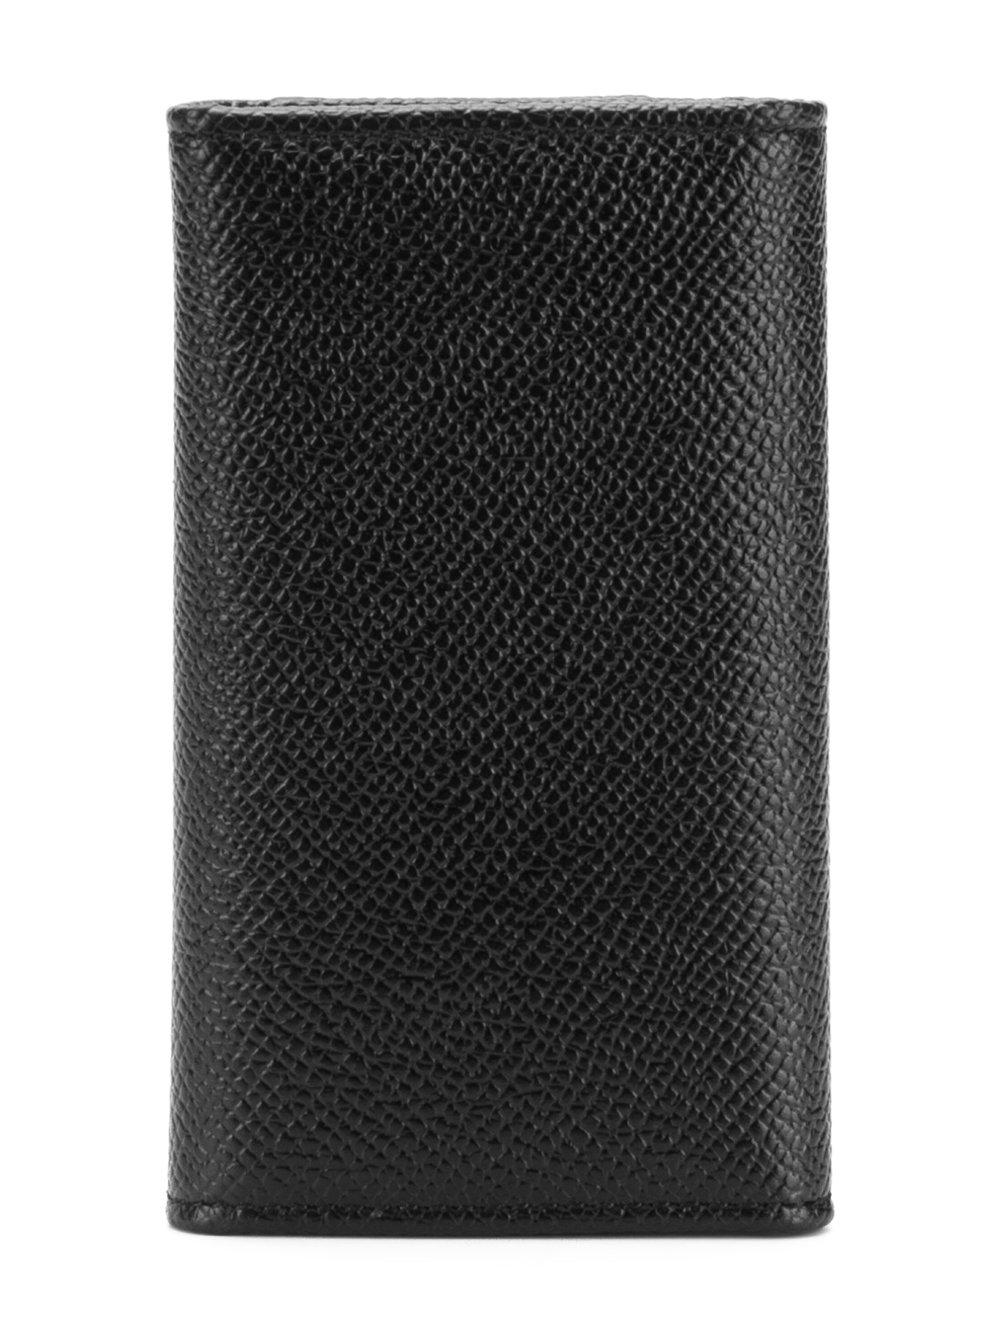 626b7978a5 Lyst - Dolce & Gabbana Foldable Keyring Wallet in Black for Men